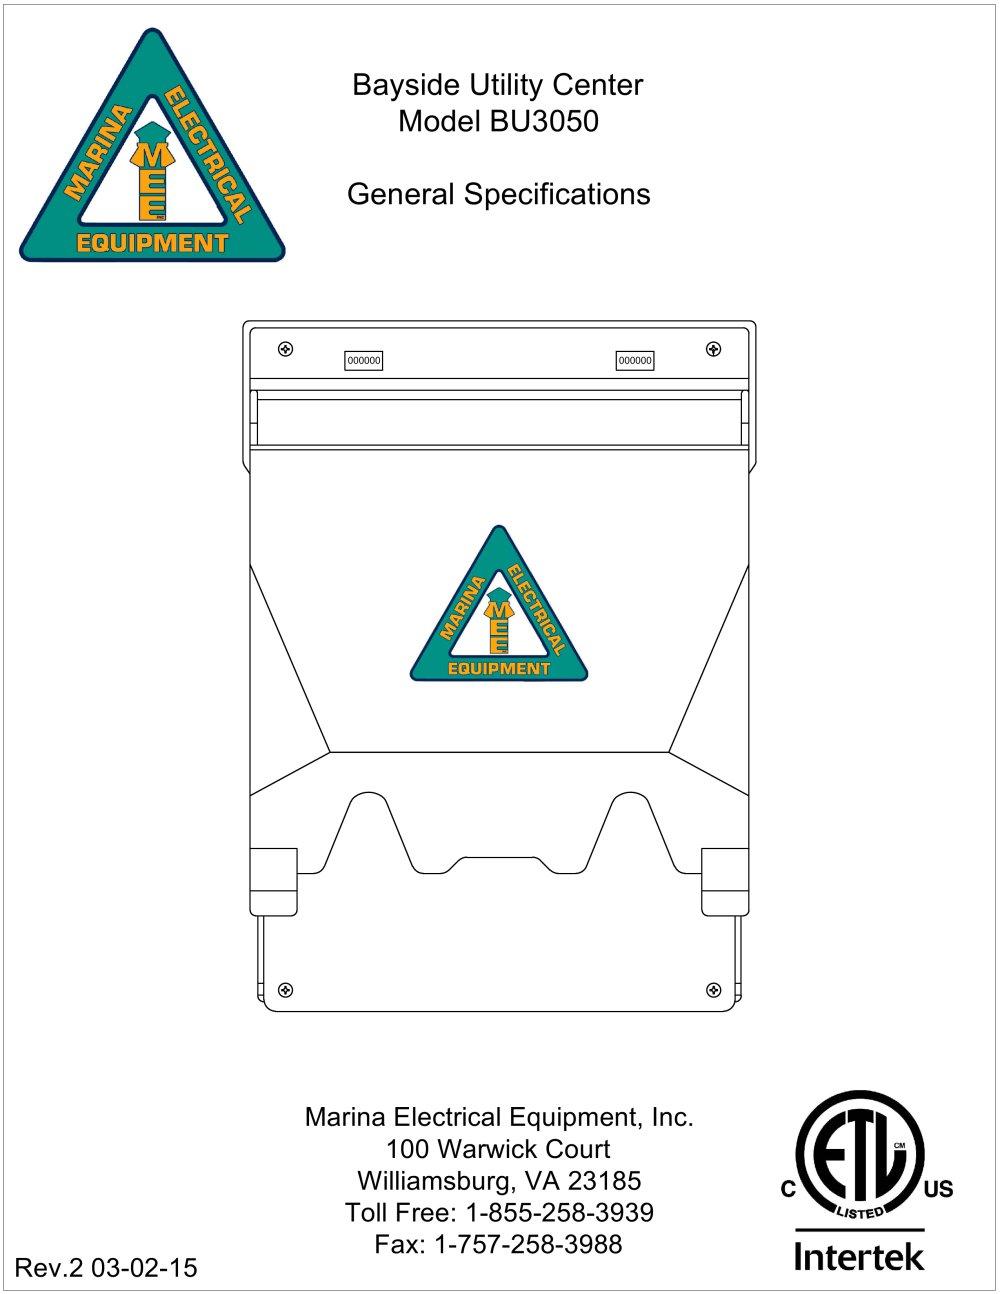 bayside utility center marina electrical equipment pdf